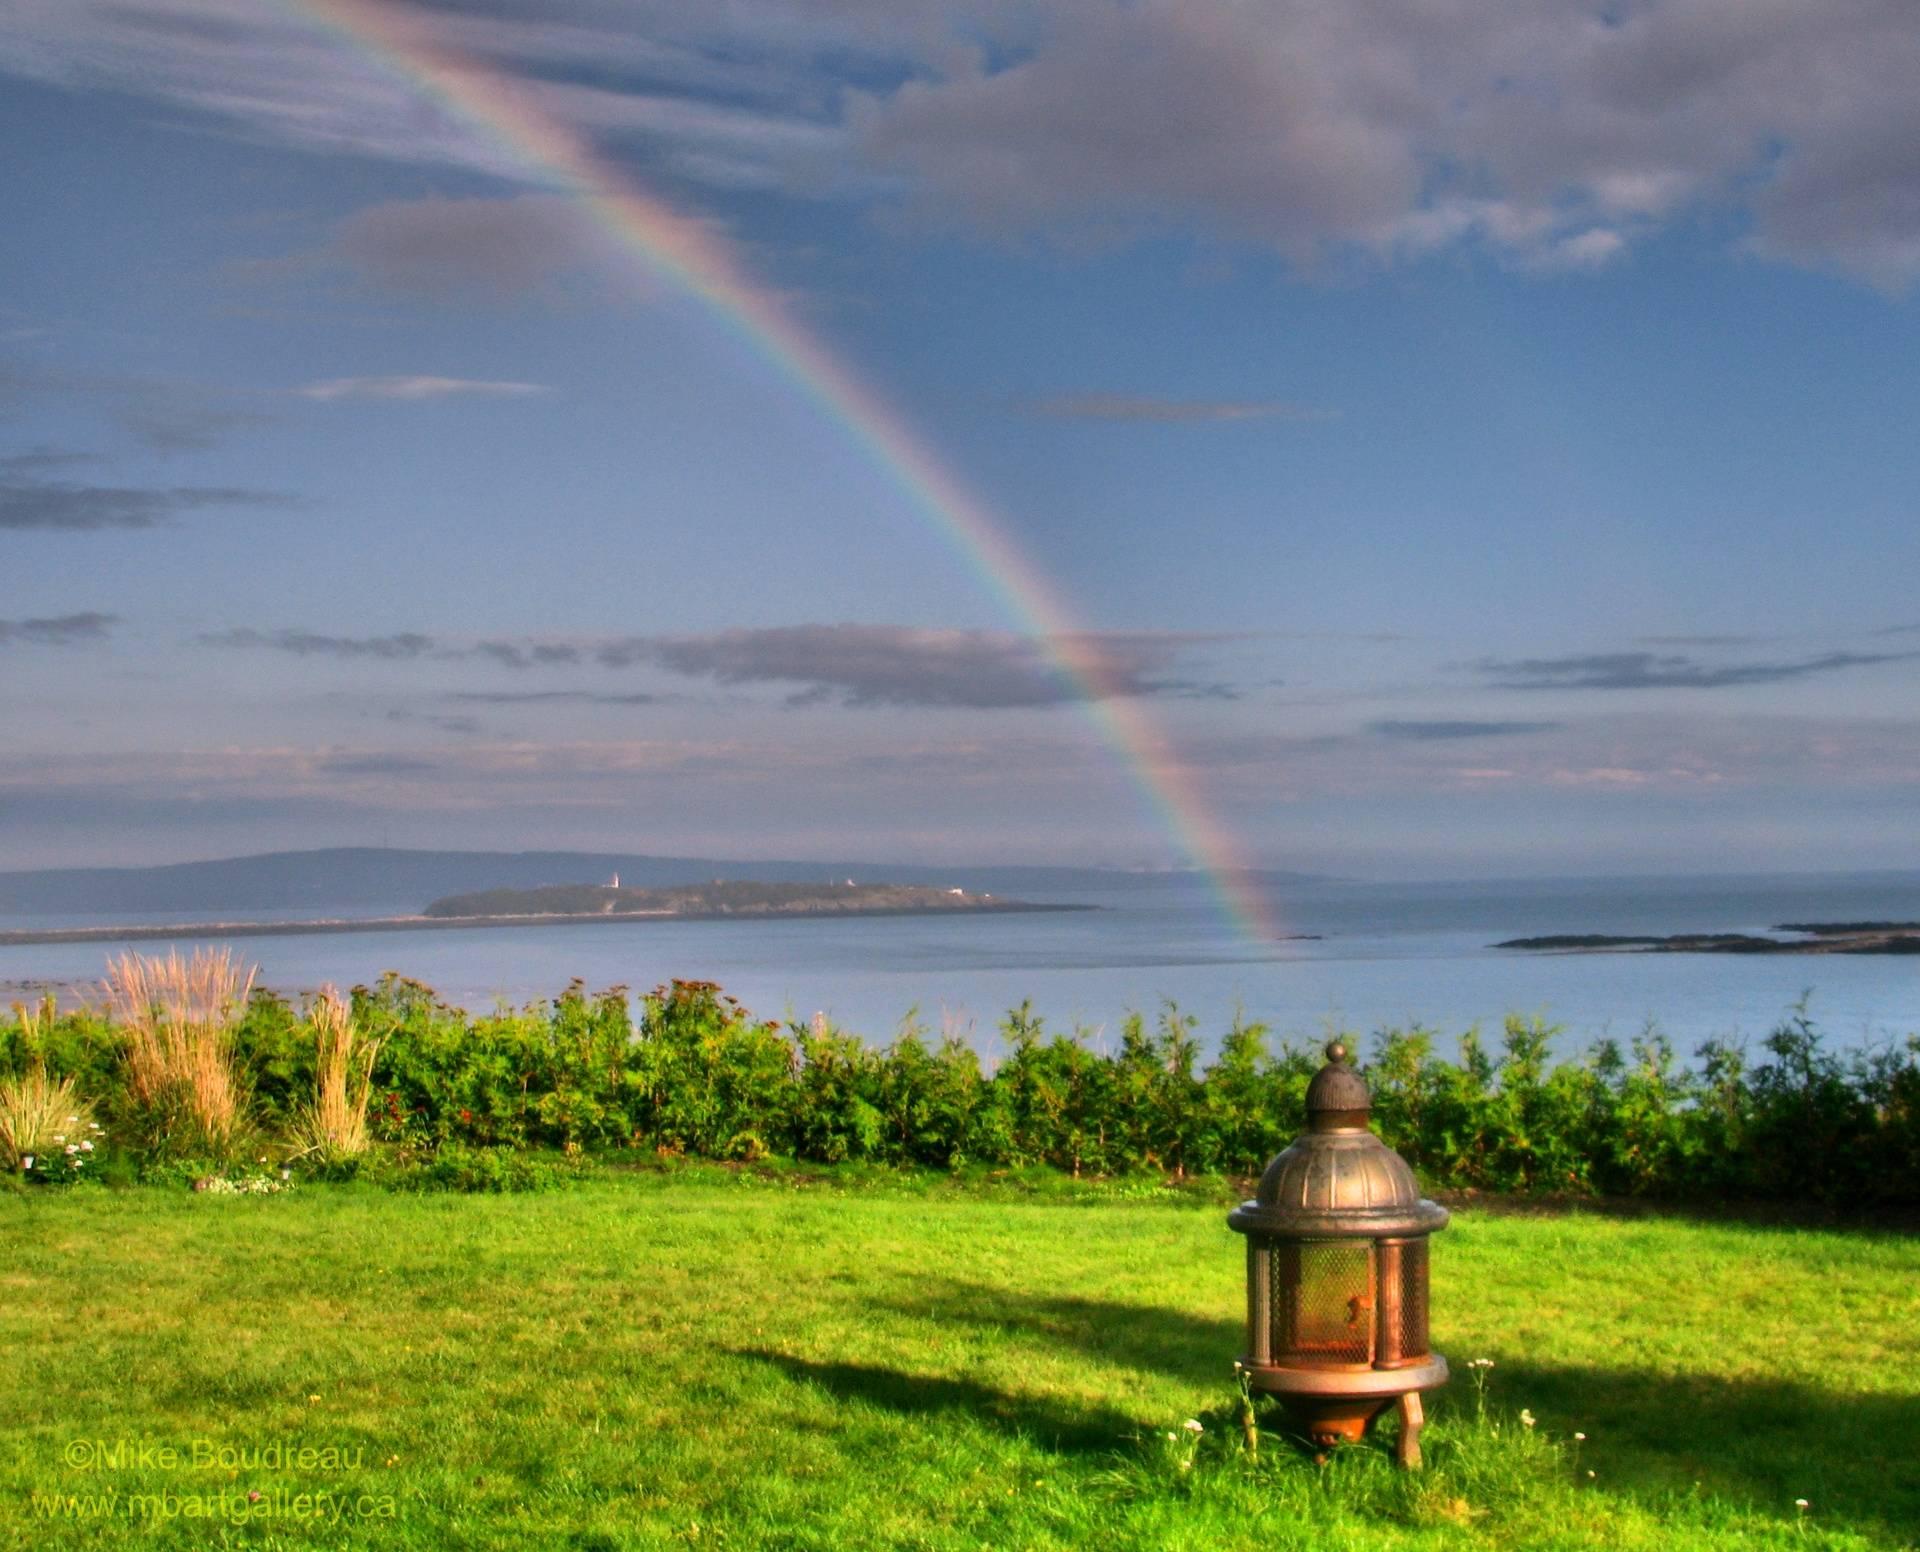 Rainbow over Partridge Island, Saint John NB